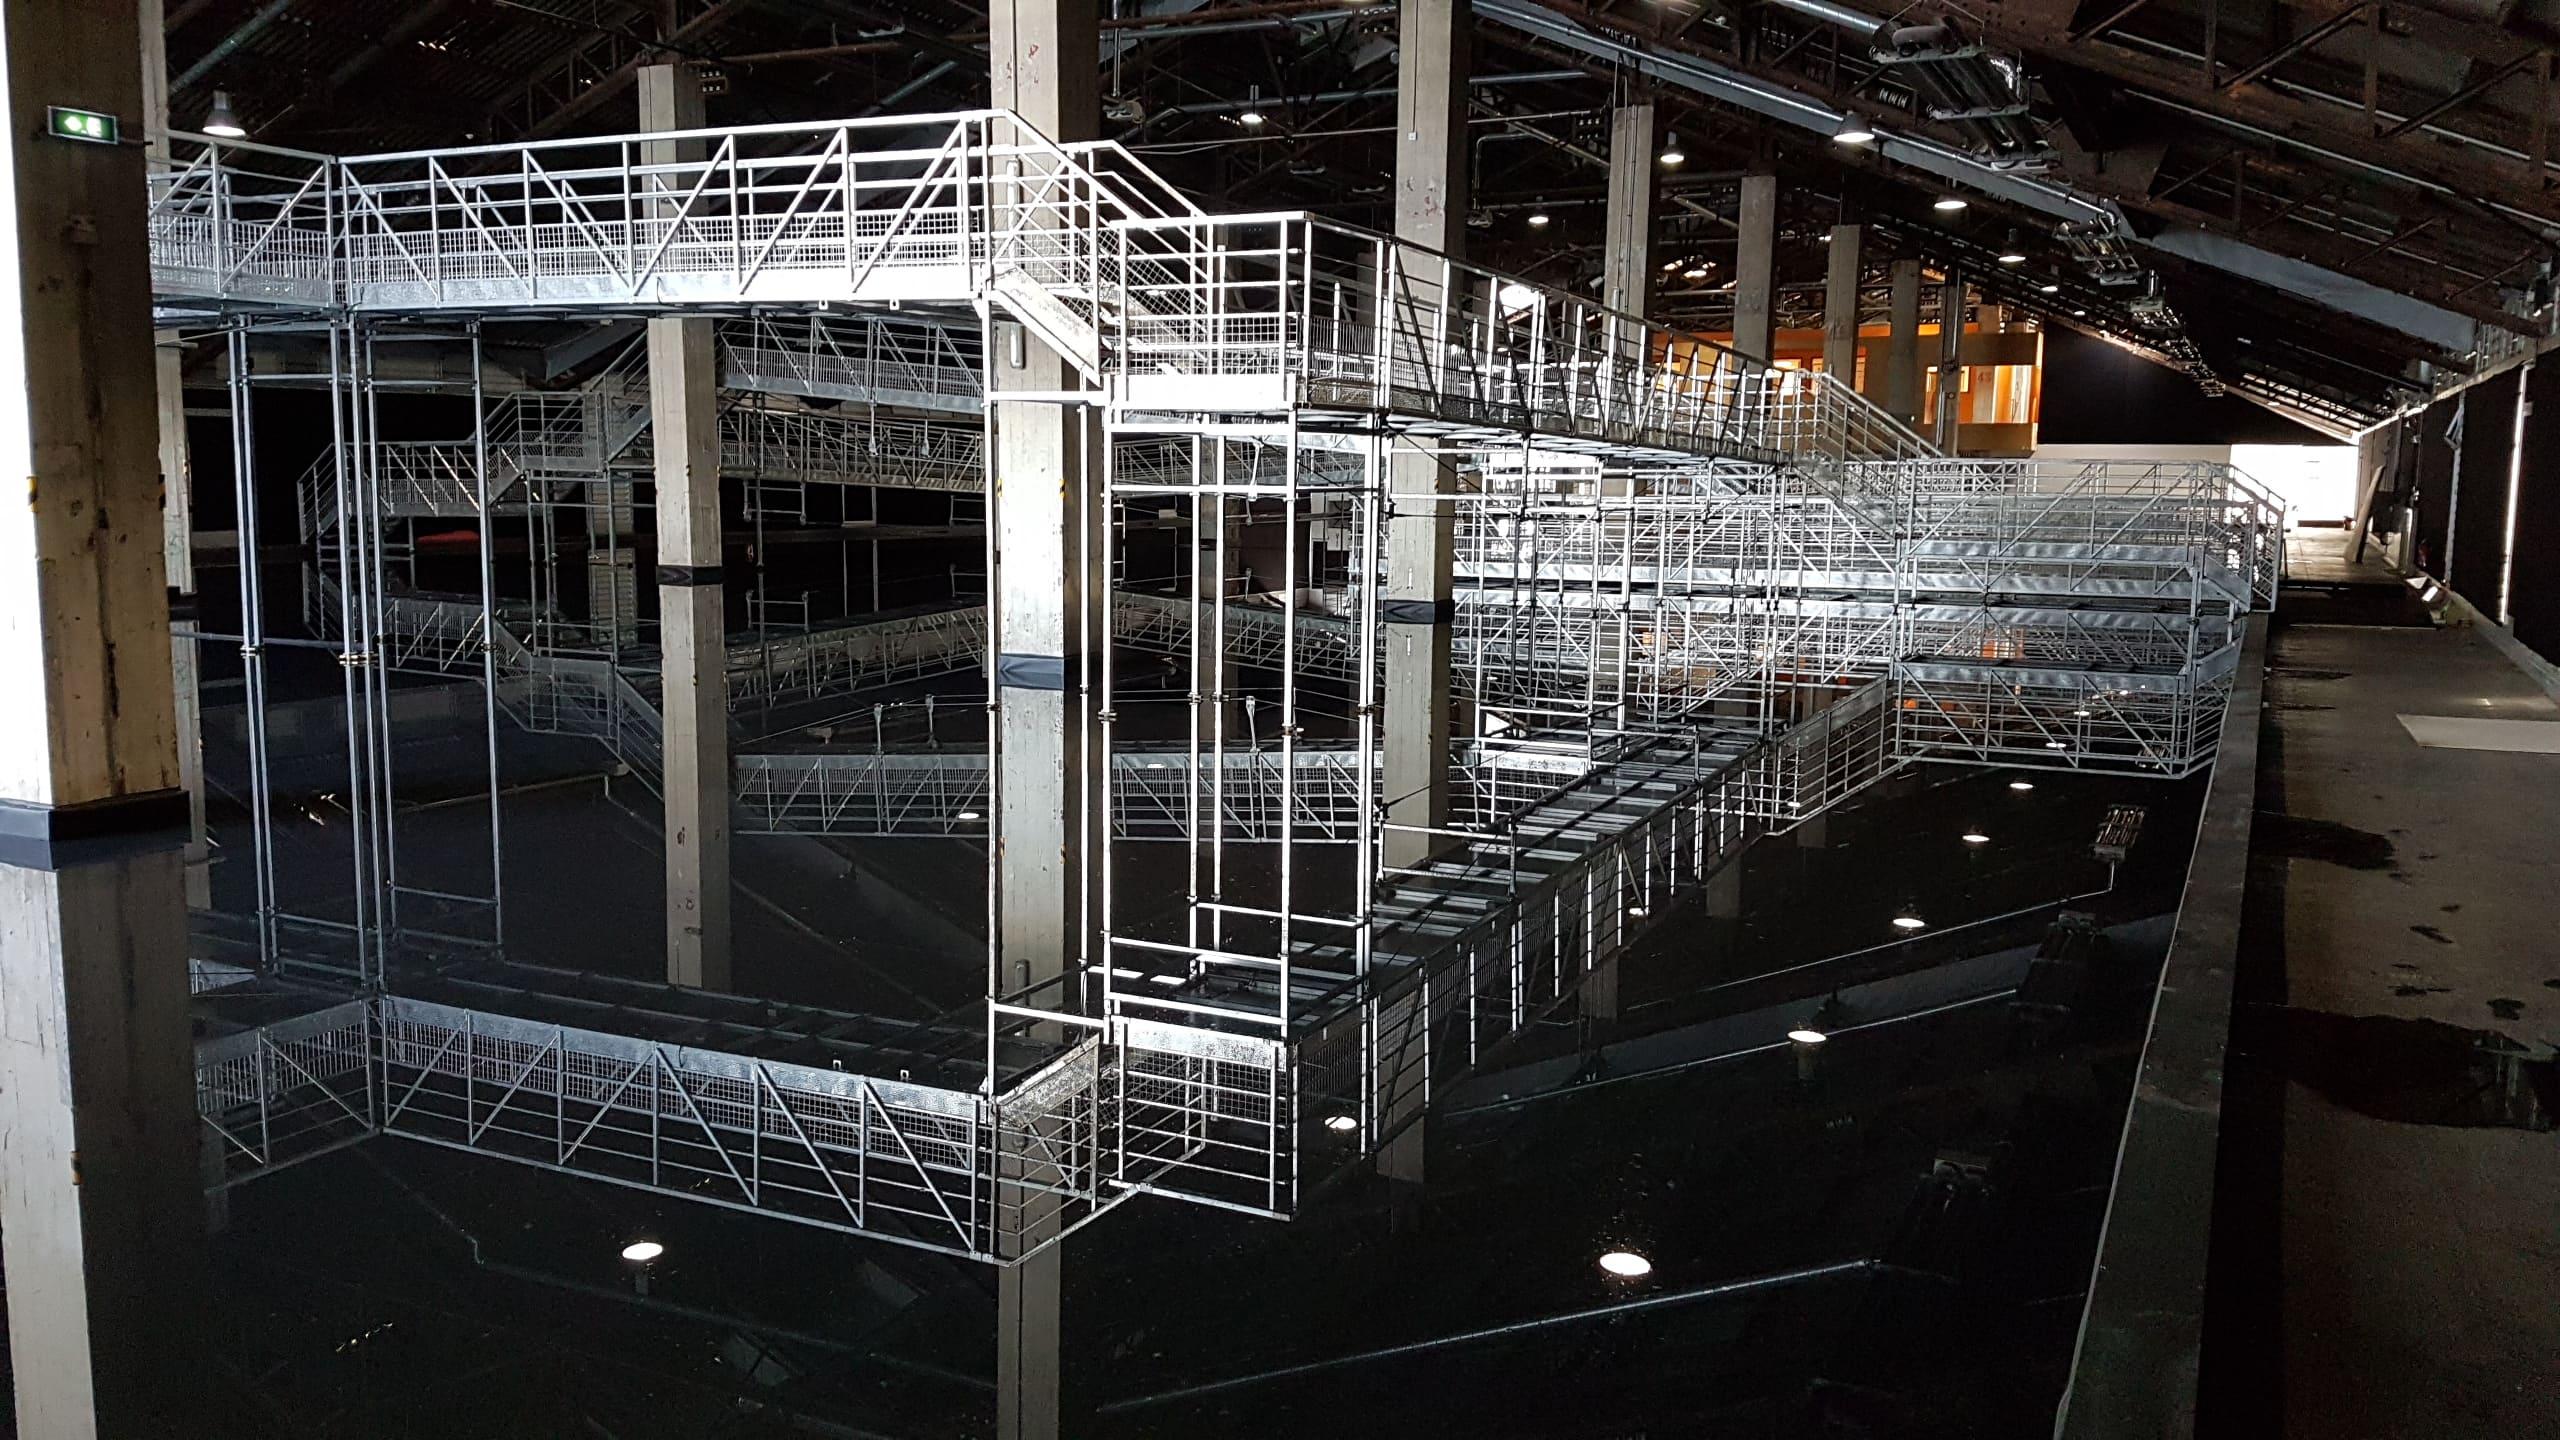 Exposition JR Hangar J1 Marseille - Passerelles avec reflets